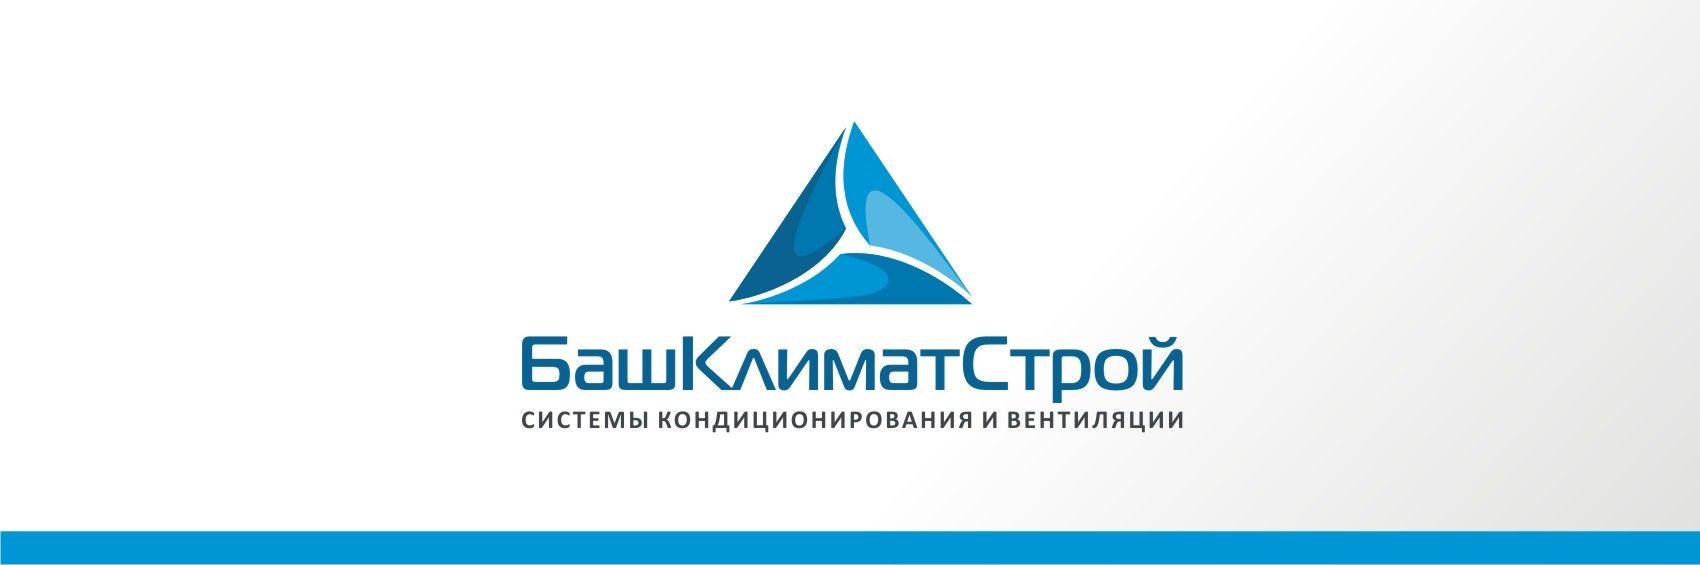 Конкурс на логотип сайта - дизайнер ideograph